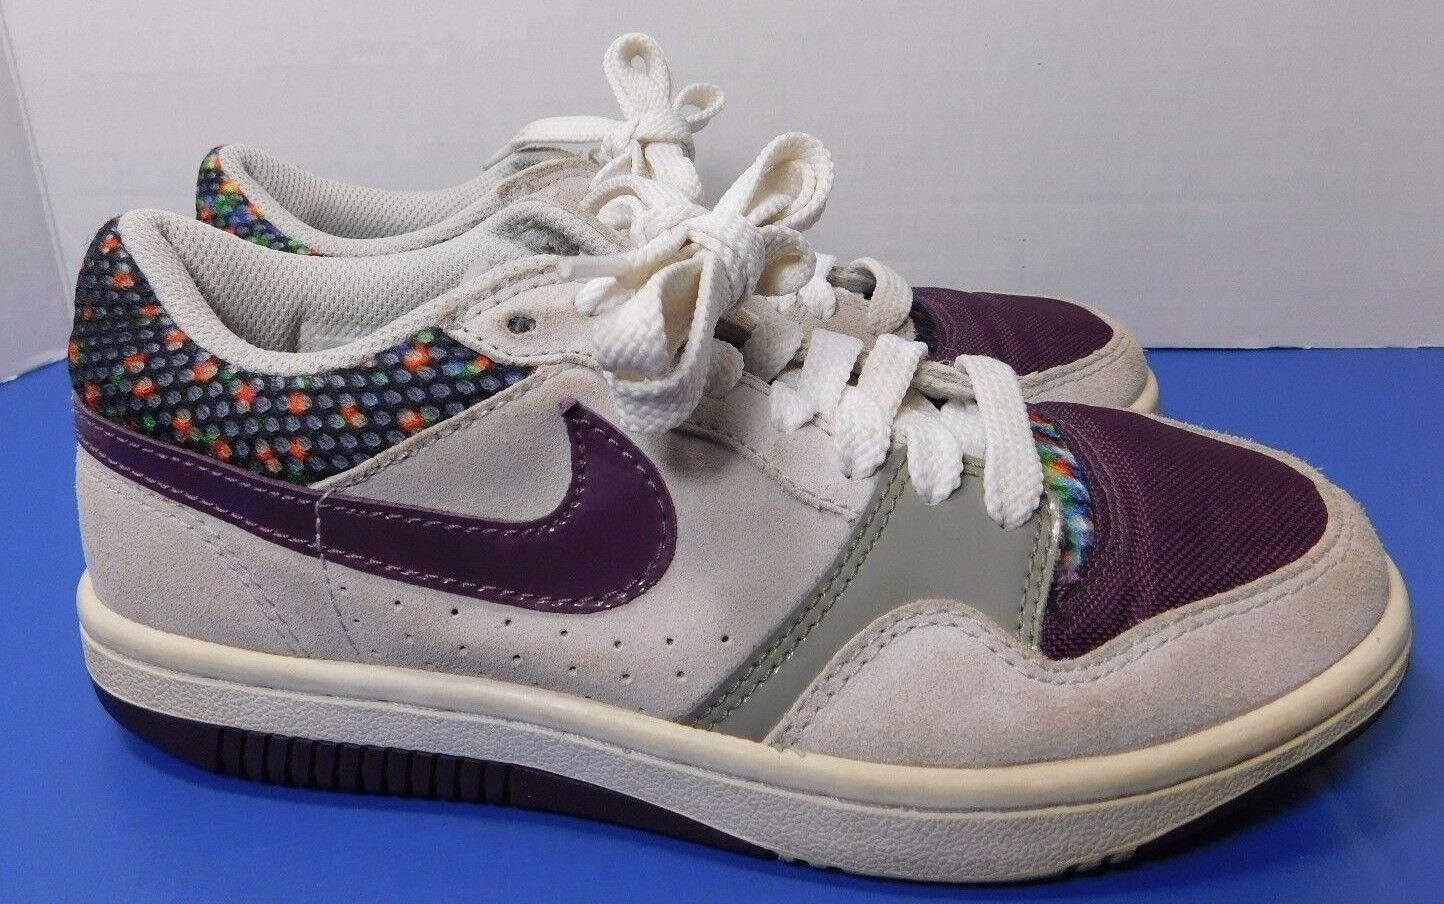 Nike Court Force Low Sneakers 315112-051 Women's Size Dot 6 Gray Purple Polka Dot Size eaf286